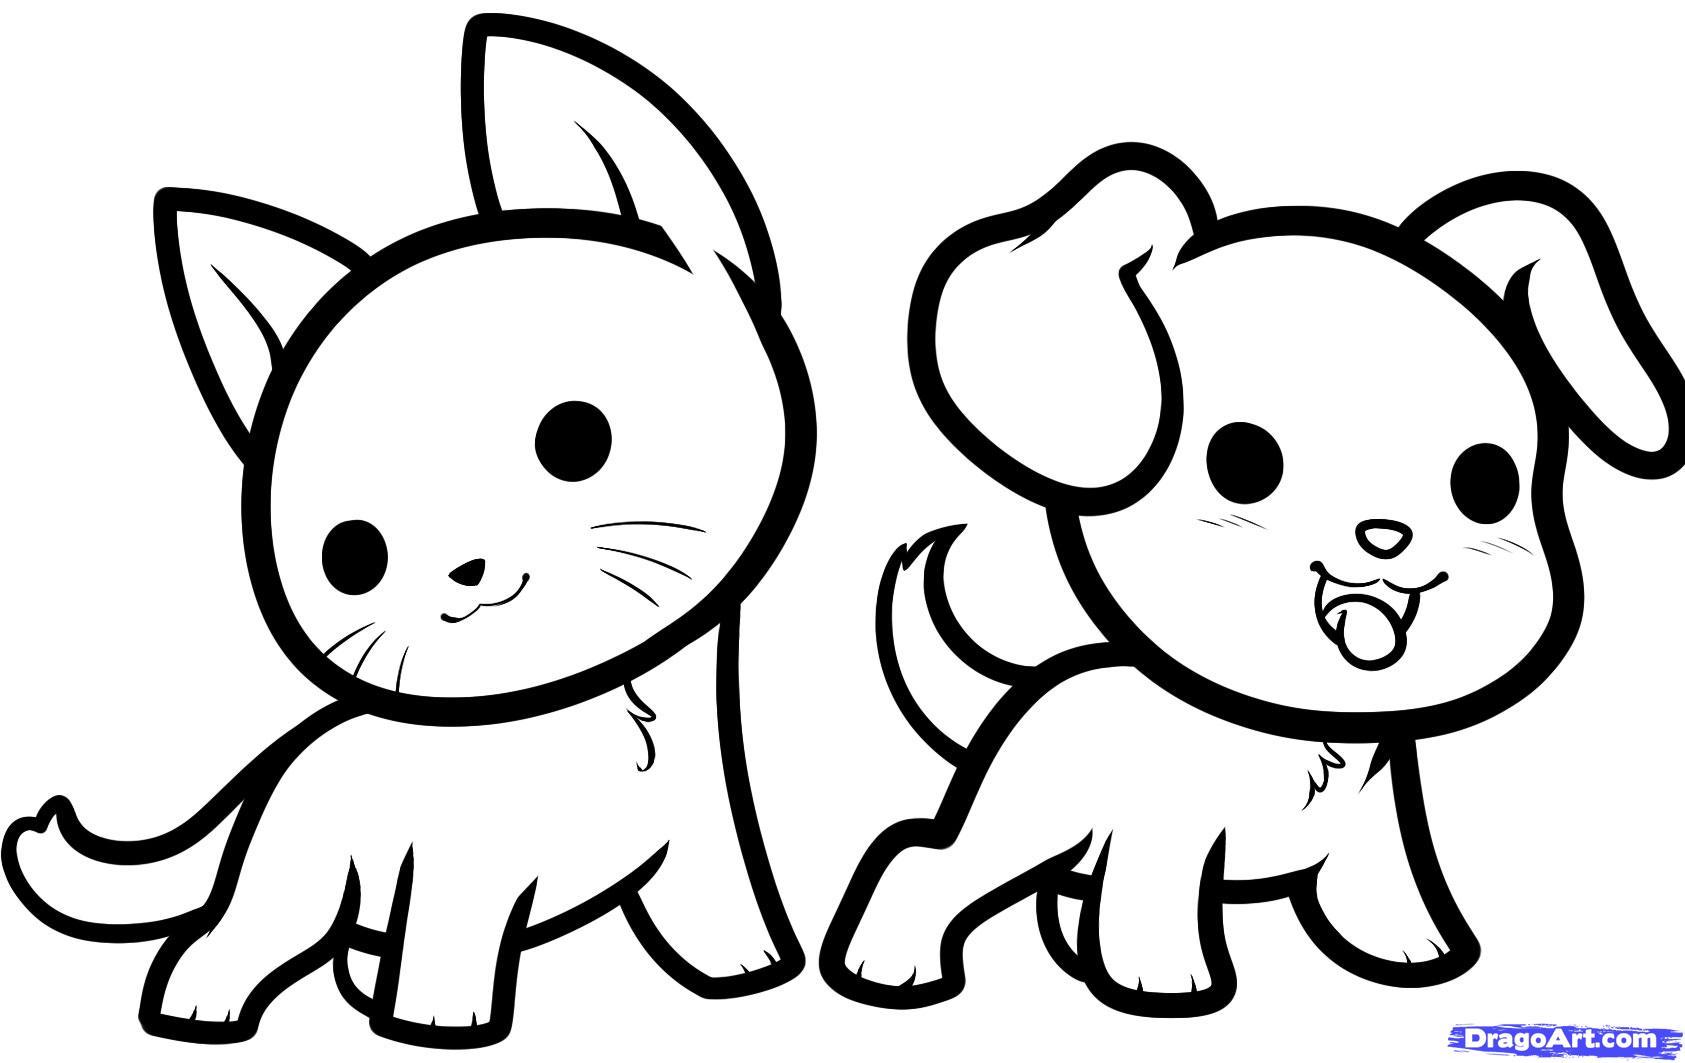 1685x1063 Animal Anime Drawings How To Draw Kawaii Animals, Step By Step